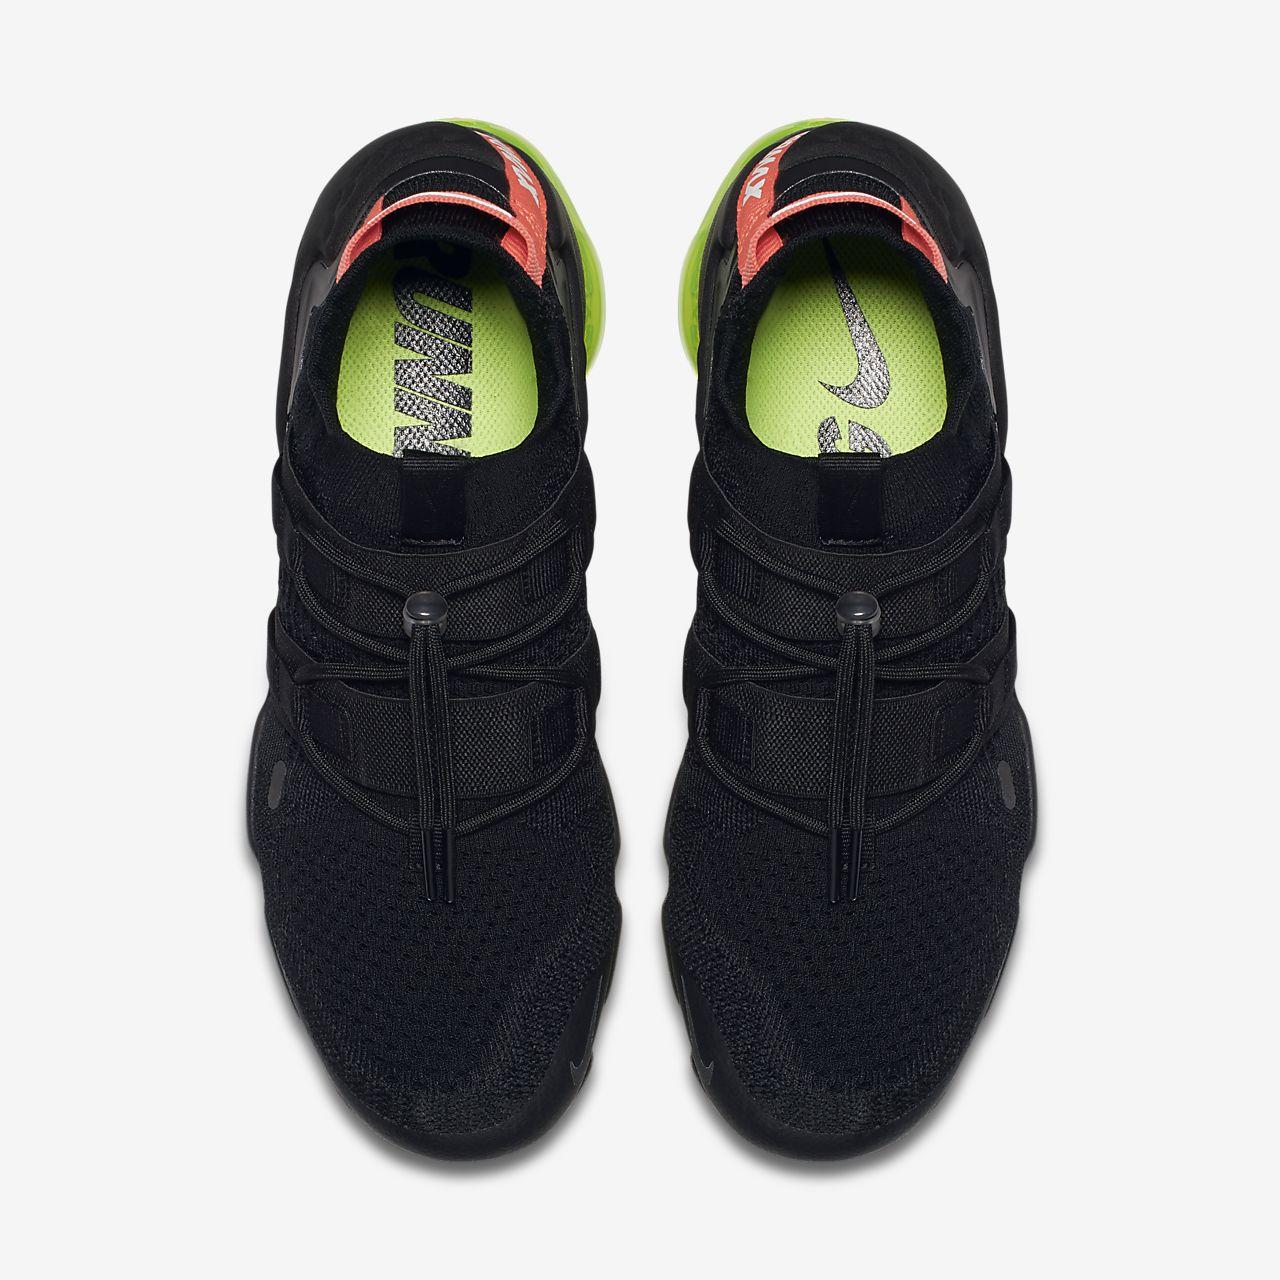 2a848474e0ce Nike Air VaporMax Flyknit Utility Shoe. Nike.com